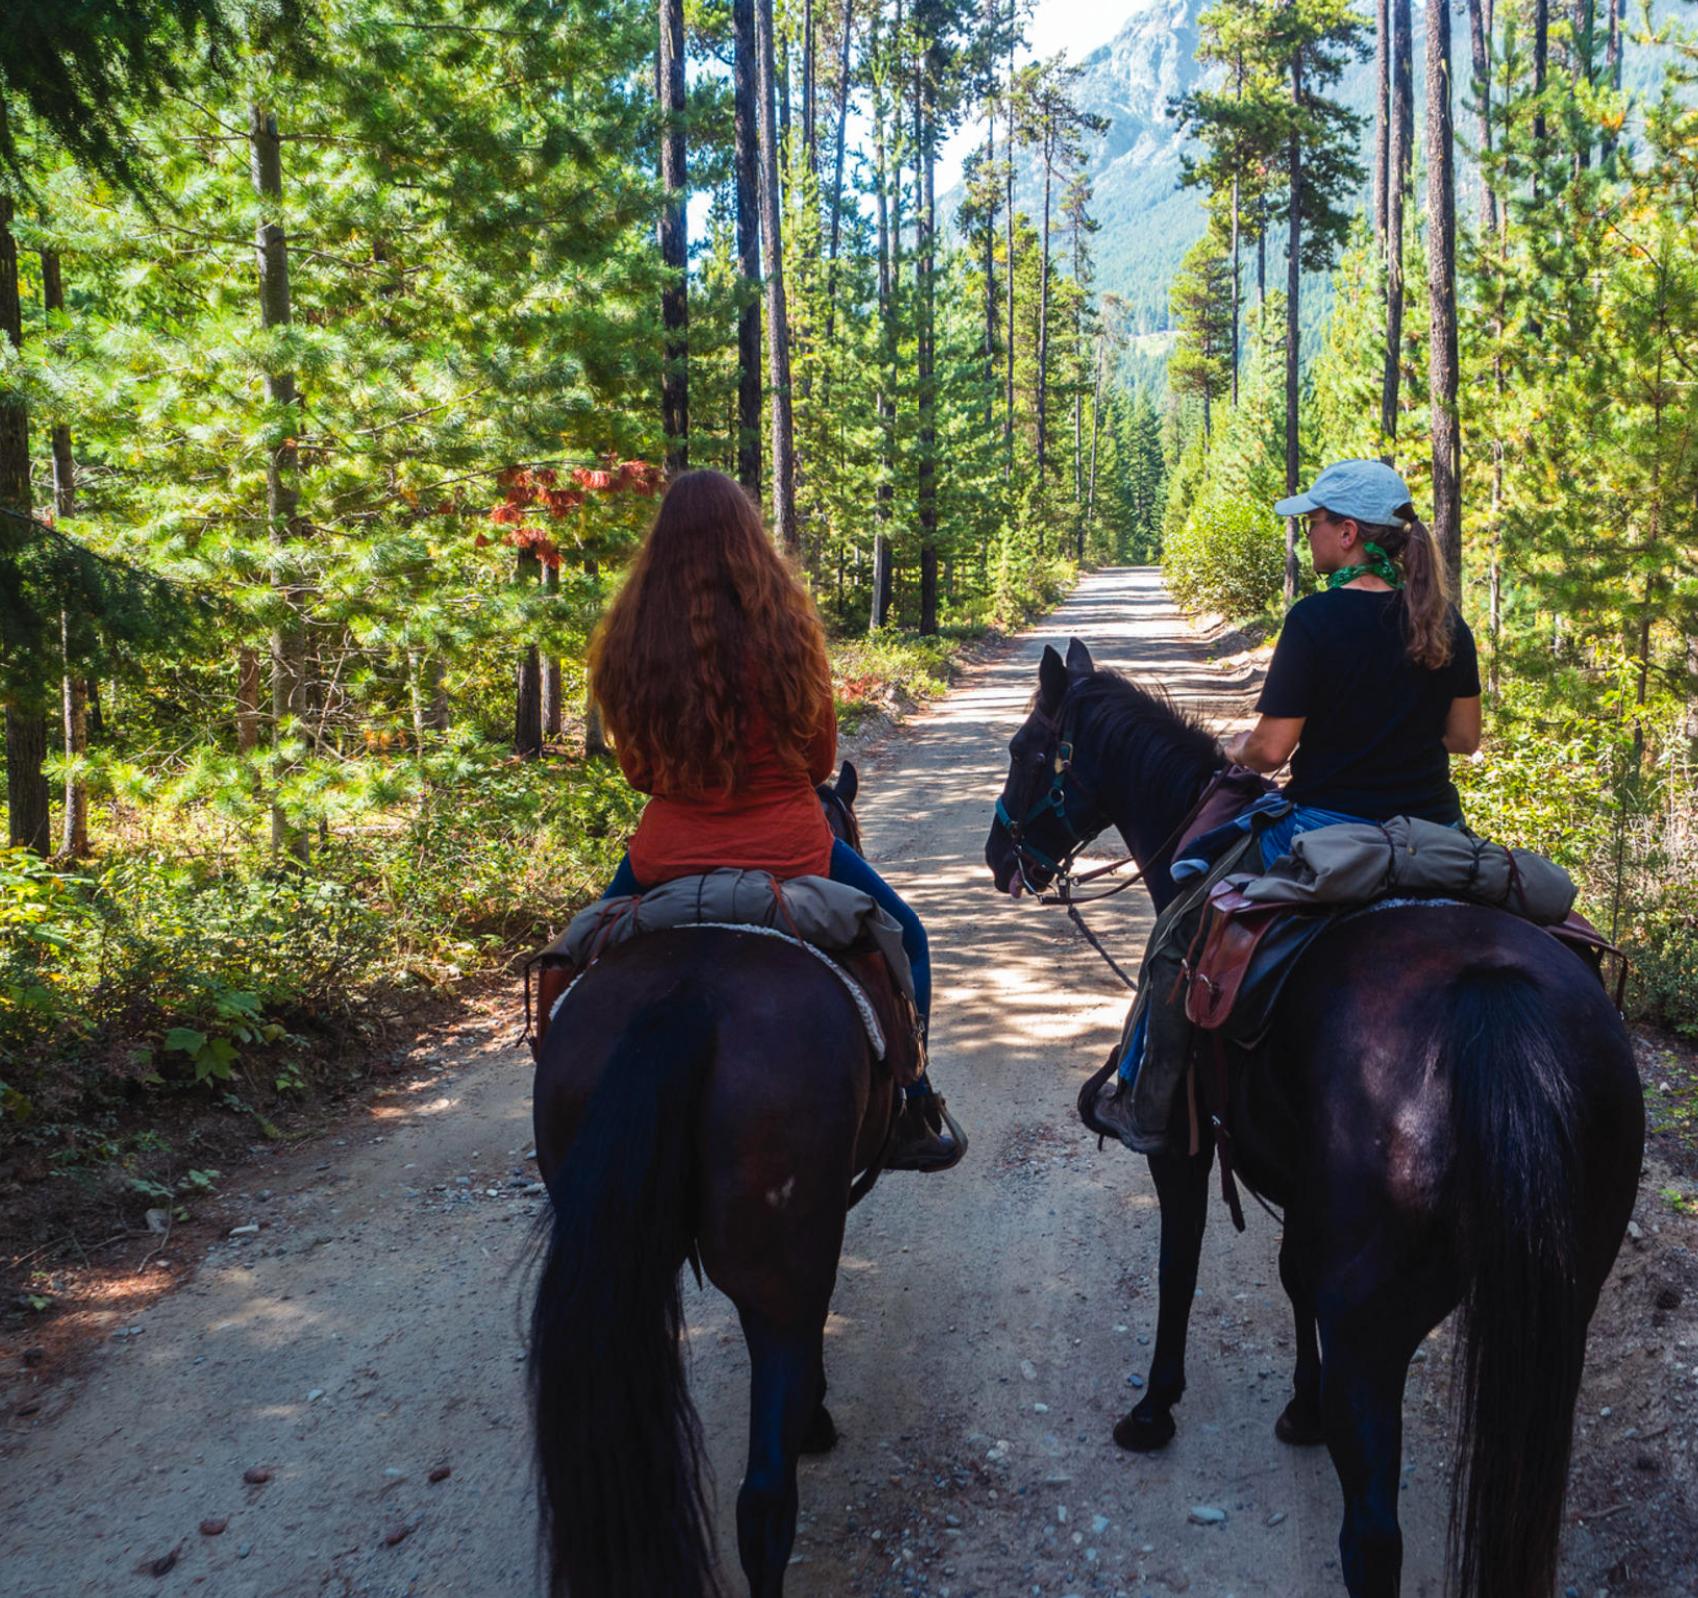 Horses. Photo by Diane Selkirk.